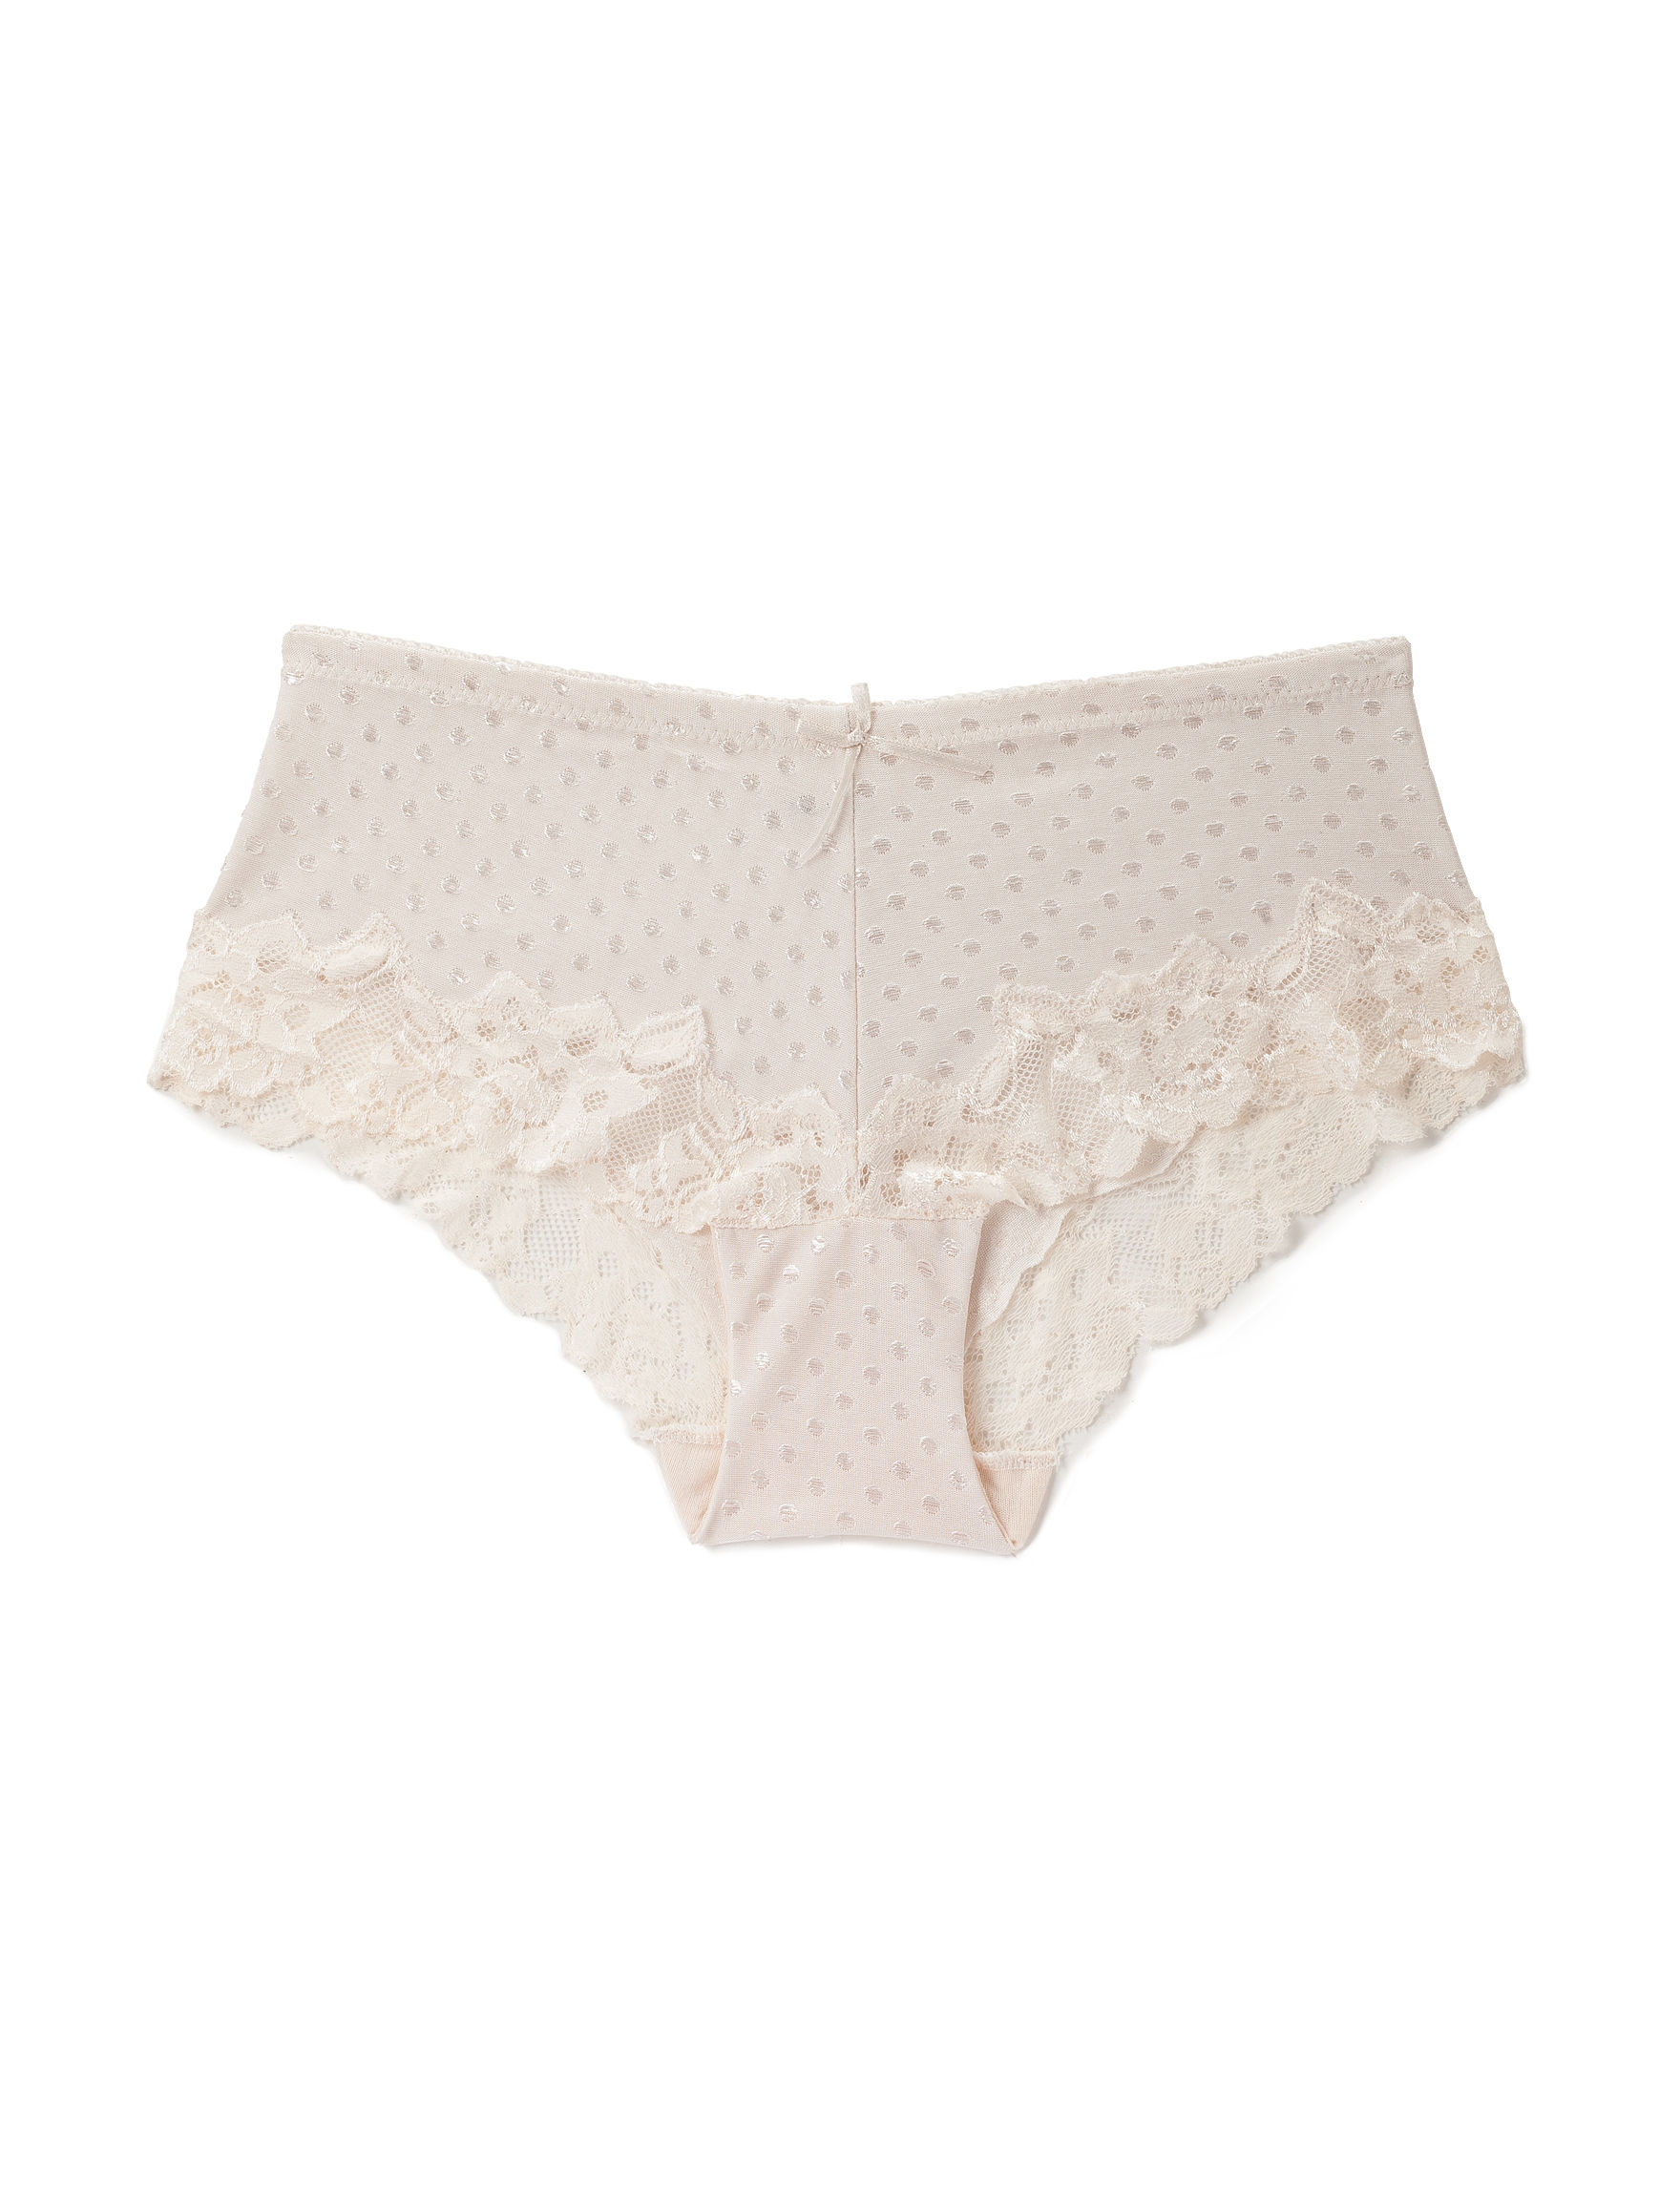 Rene Rofe Beige Panties Hipster